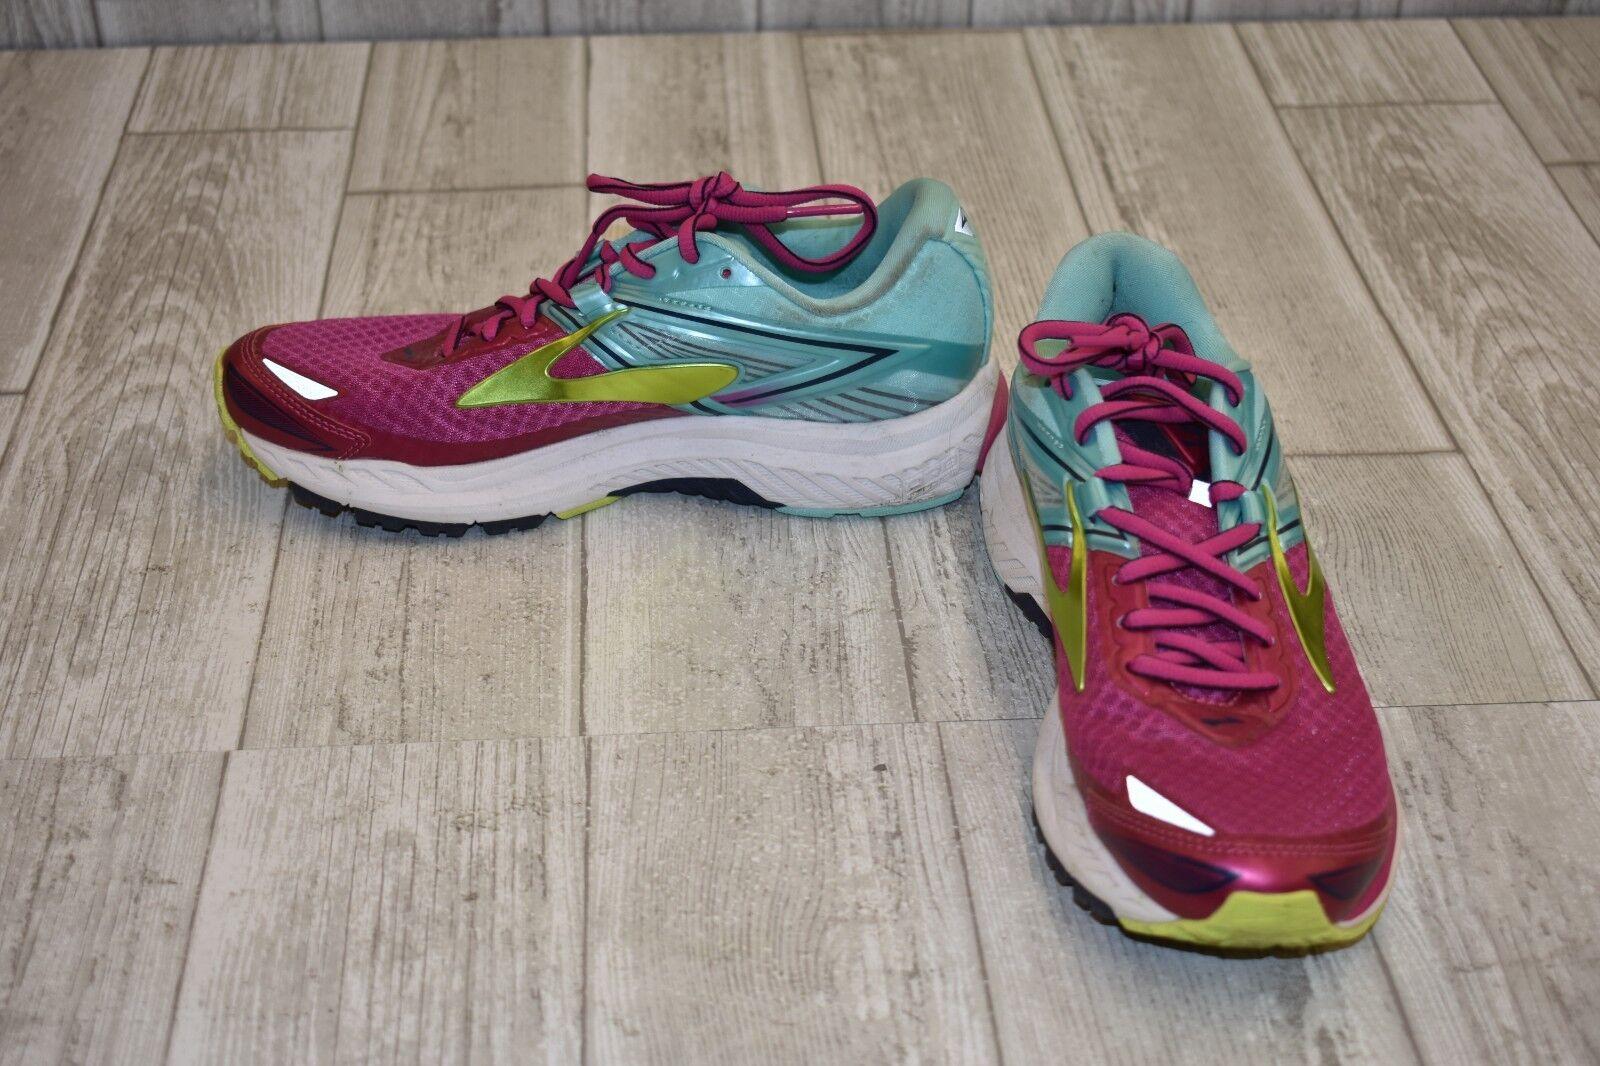 Brooks Ravenna 8 Running Shoes - Women's Size 7.5B - Multicolor